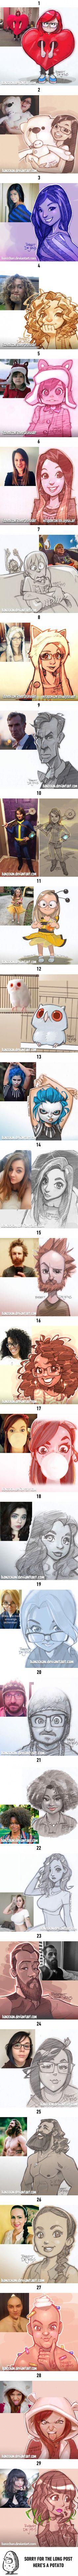 Artist Robert DeJesus Turns Strangers Into Anime Characters - 9GAG